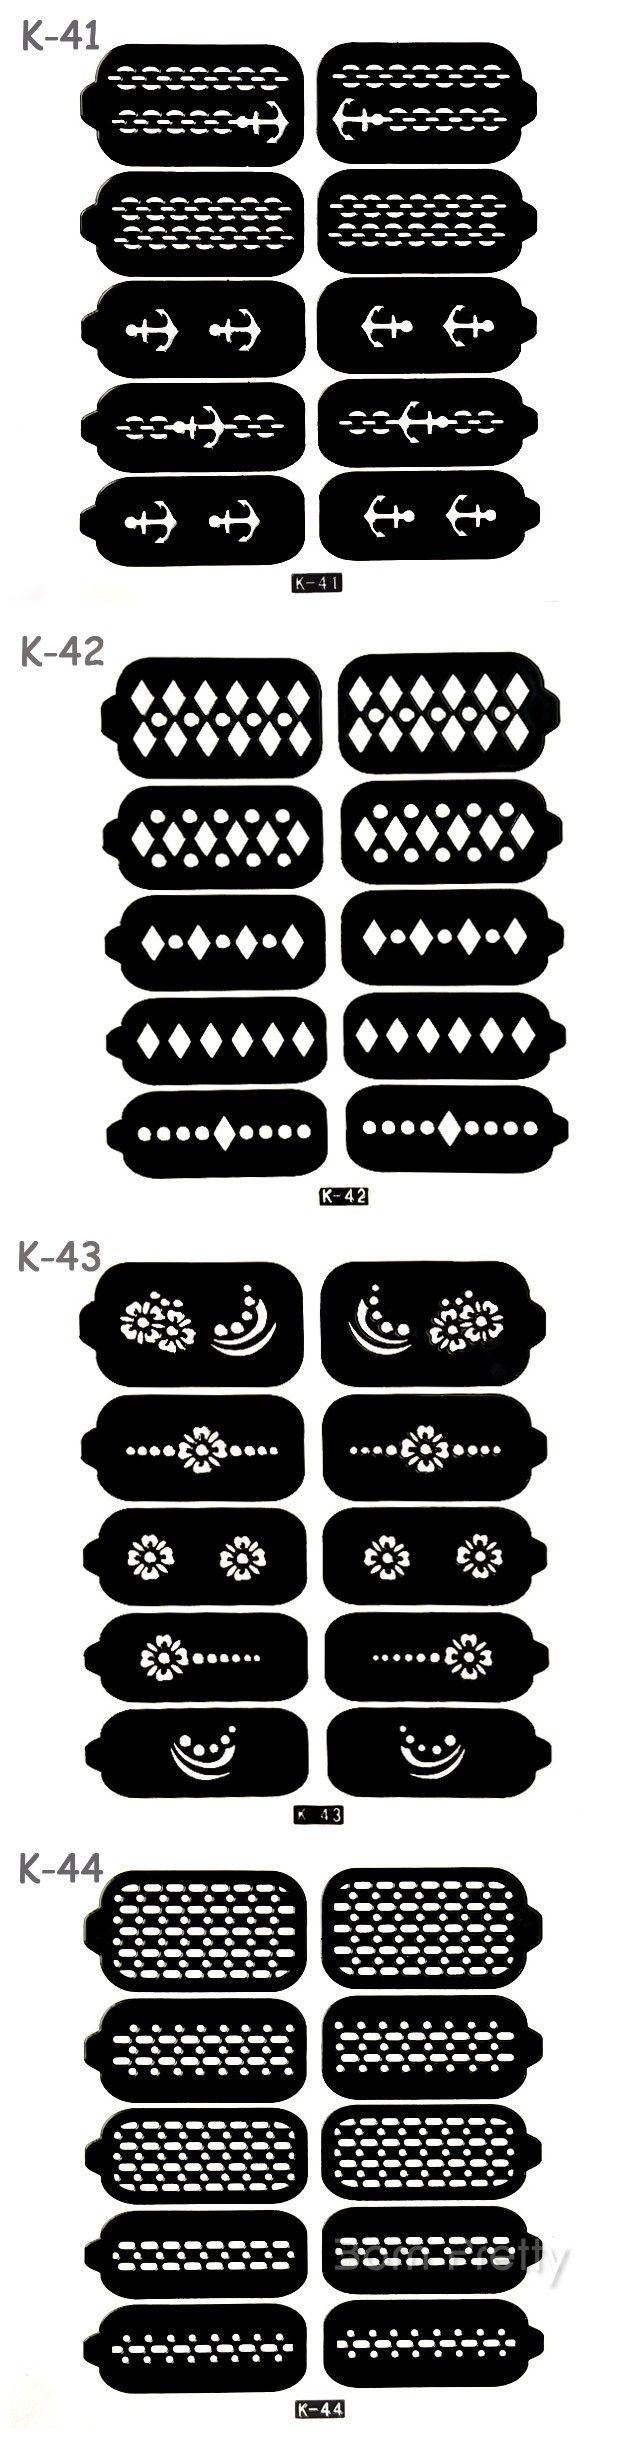 $3.99 10 Tips/Sheet Nail Vinyls Chain Anchor Pattern Nail Stencil Stickers#K41/K42/K43/K44 - BornPrettyStore.com